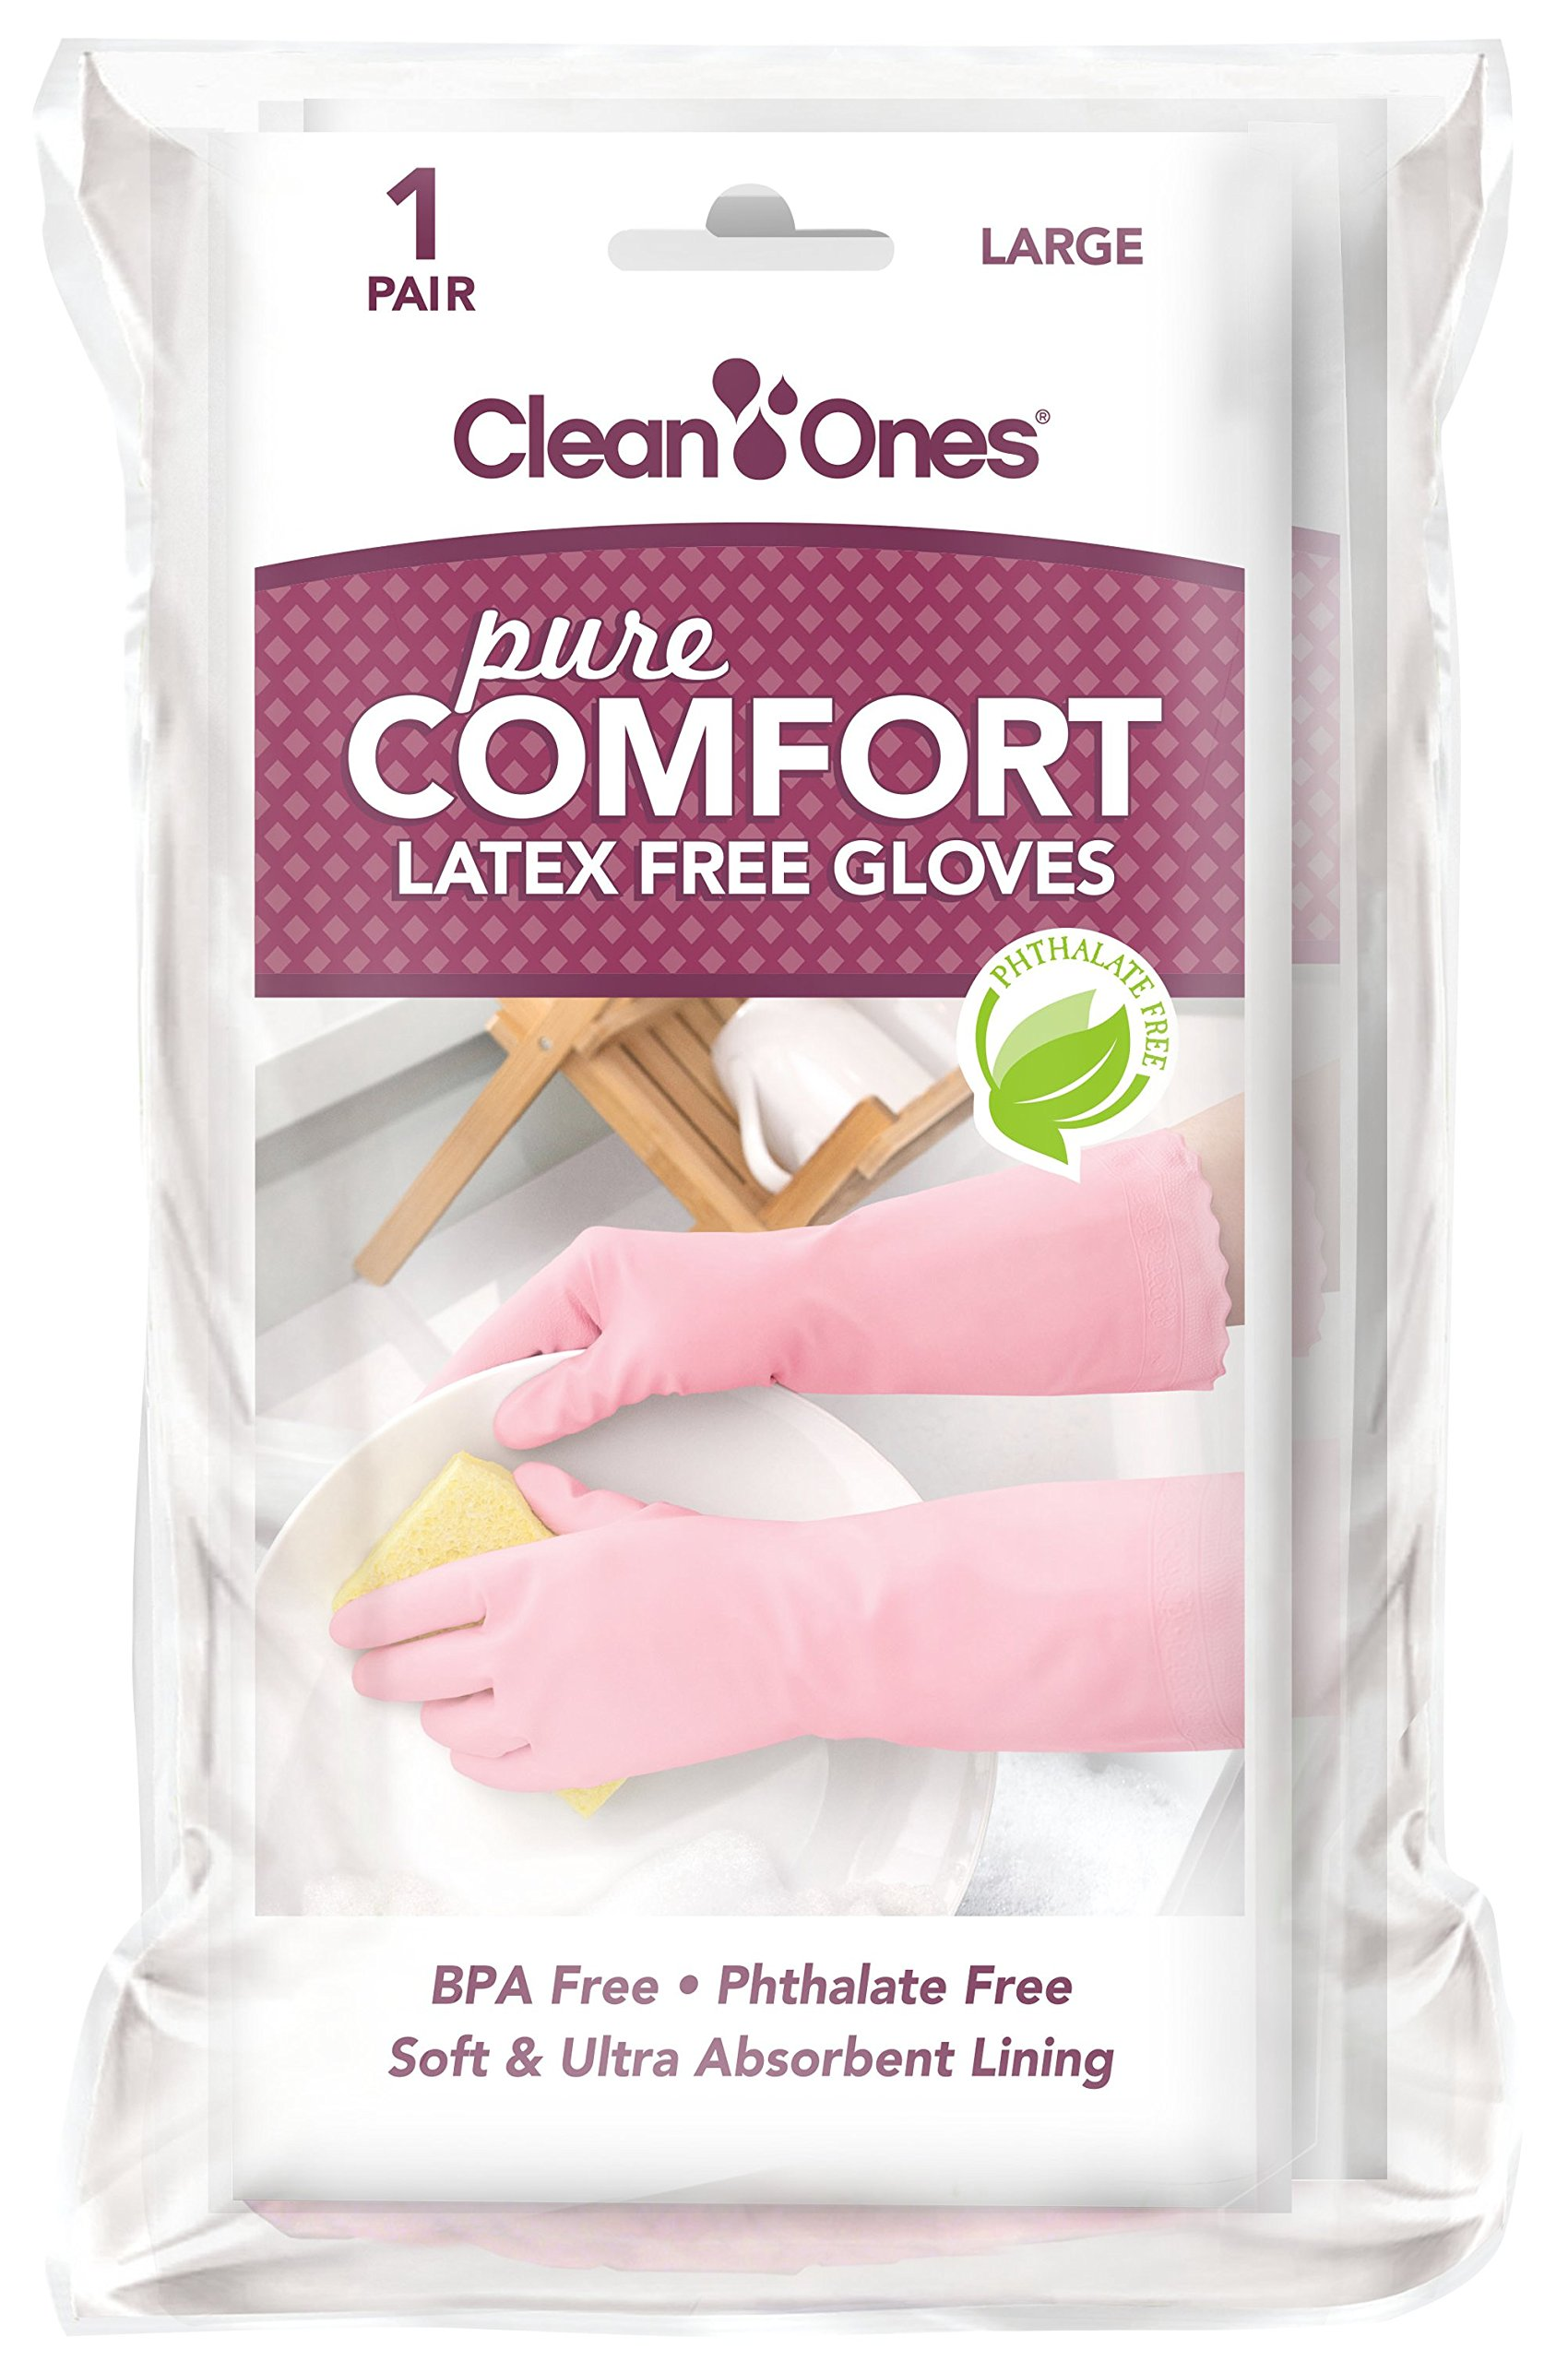 Clean Ones Pure Comfort Latex Free Vinyl Gloves - 2pr (Large)